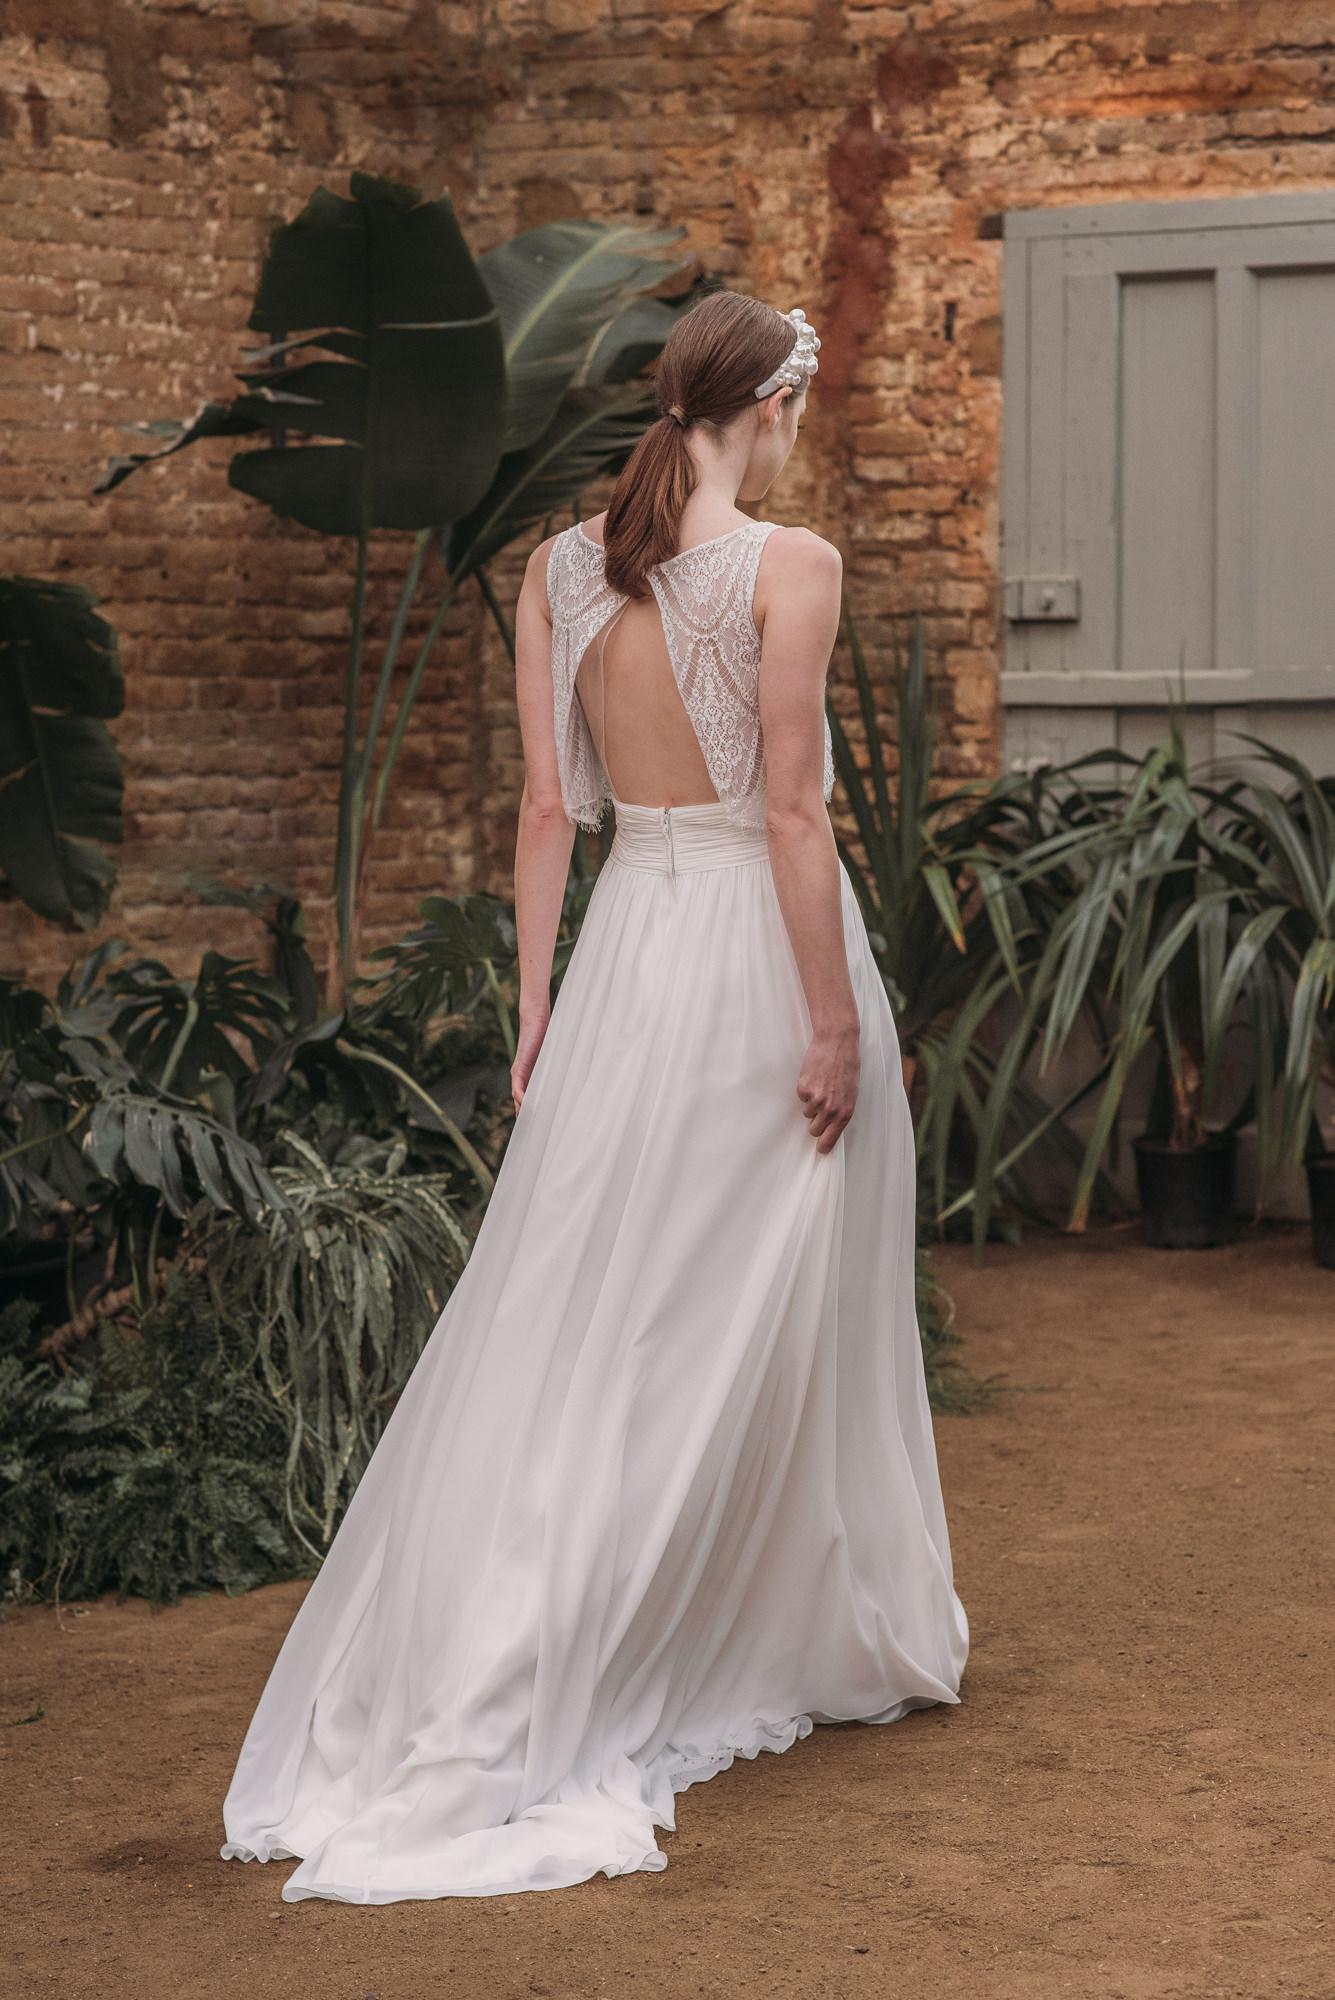 Vestido de novia 5802 de fara sposa